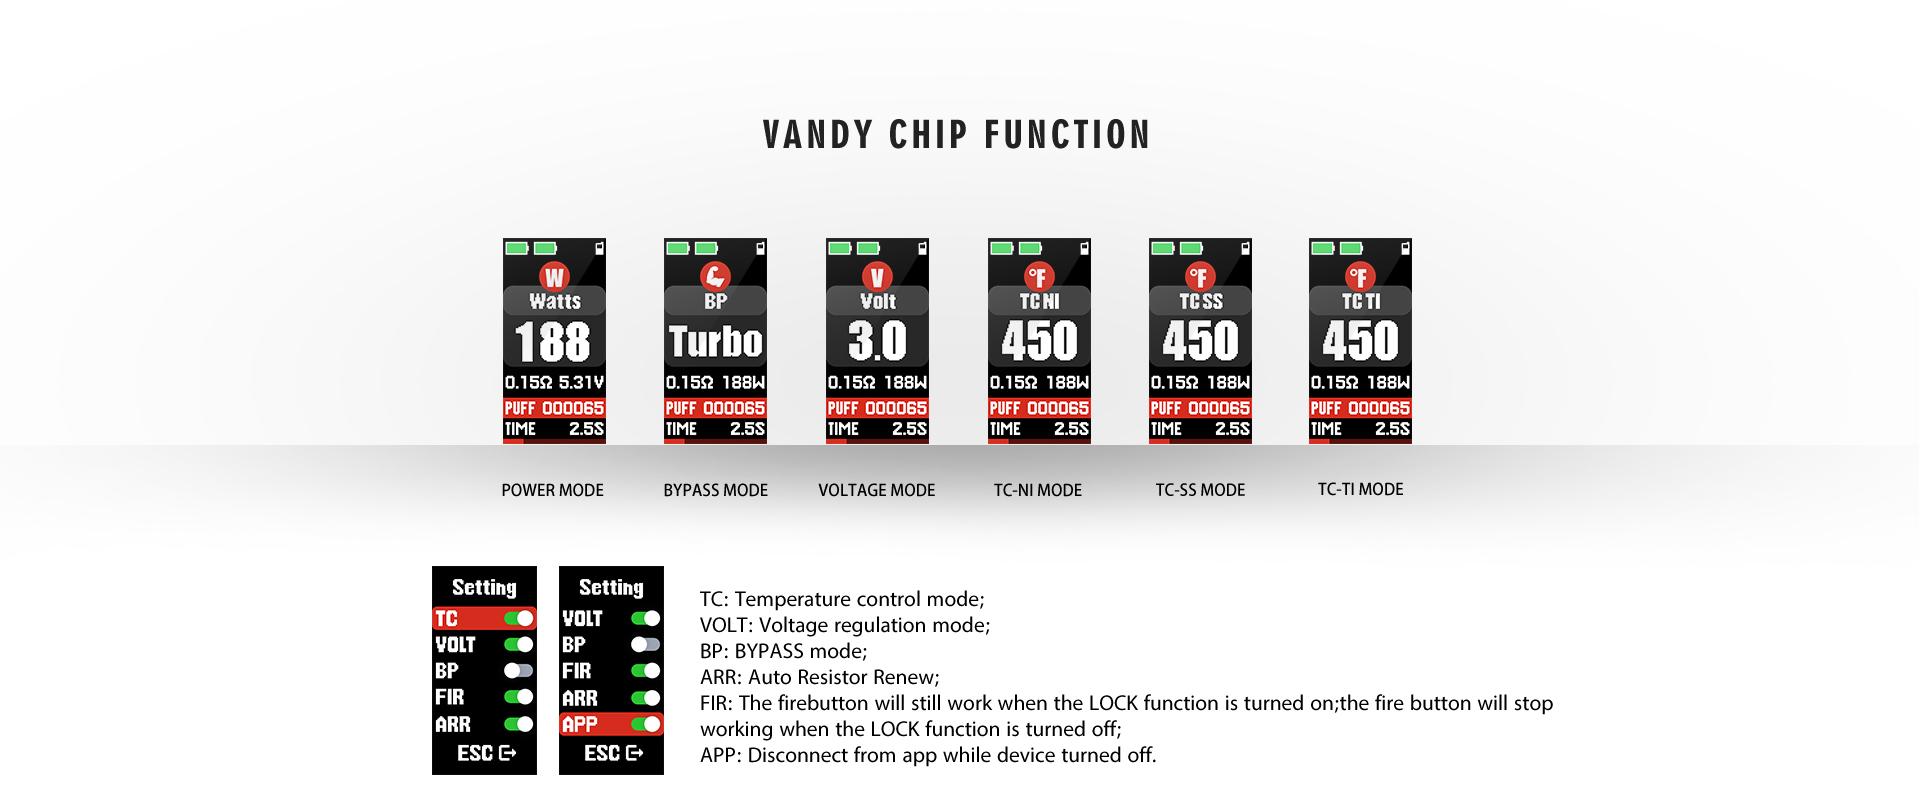 Vandy Vape Gaur-21 Mod - Vandy Chip Function